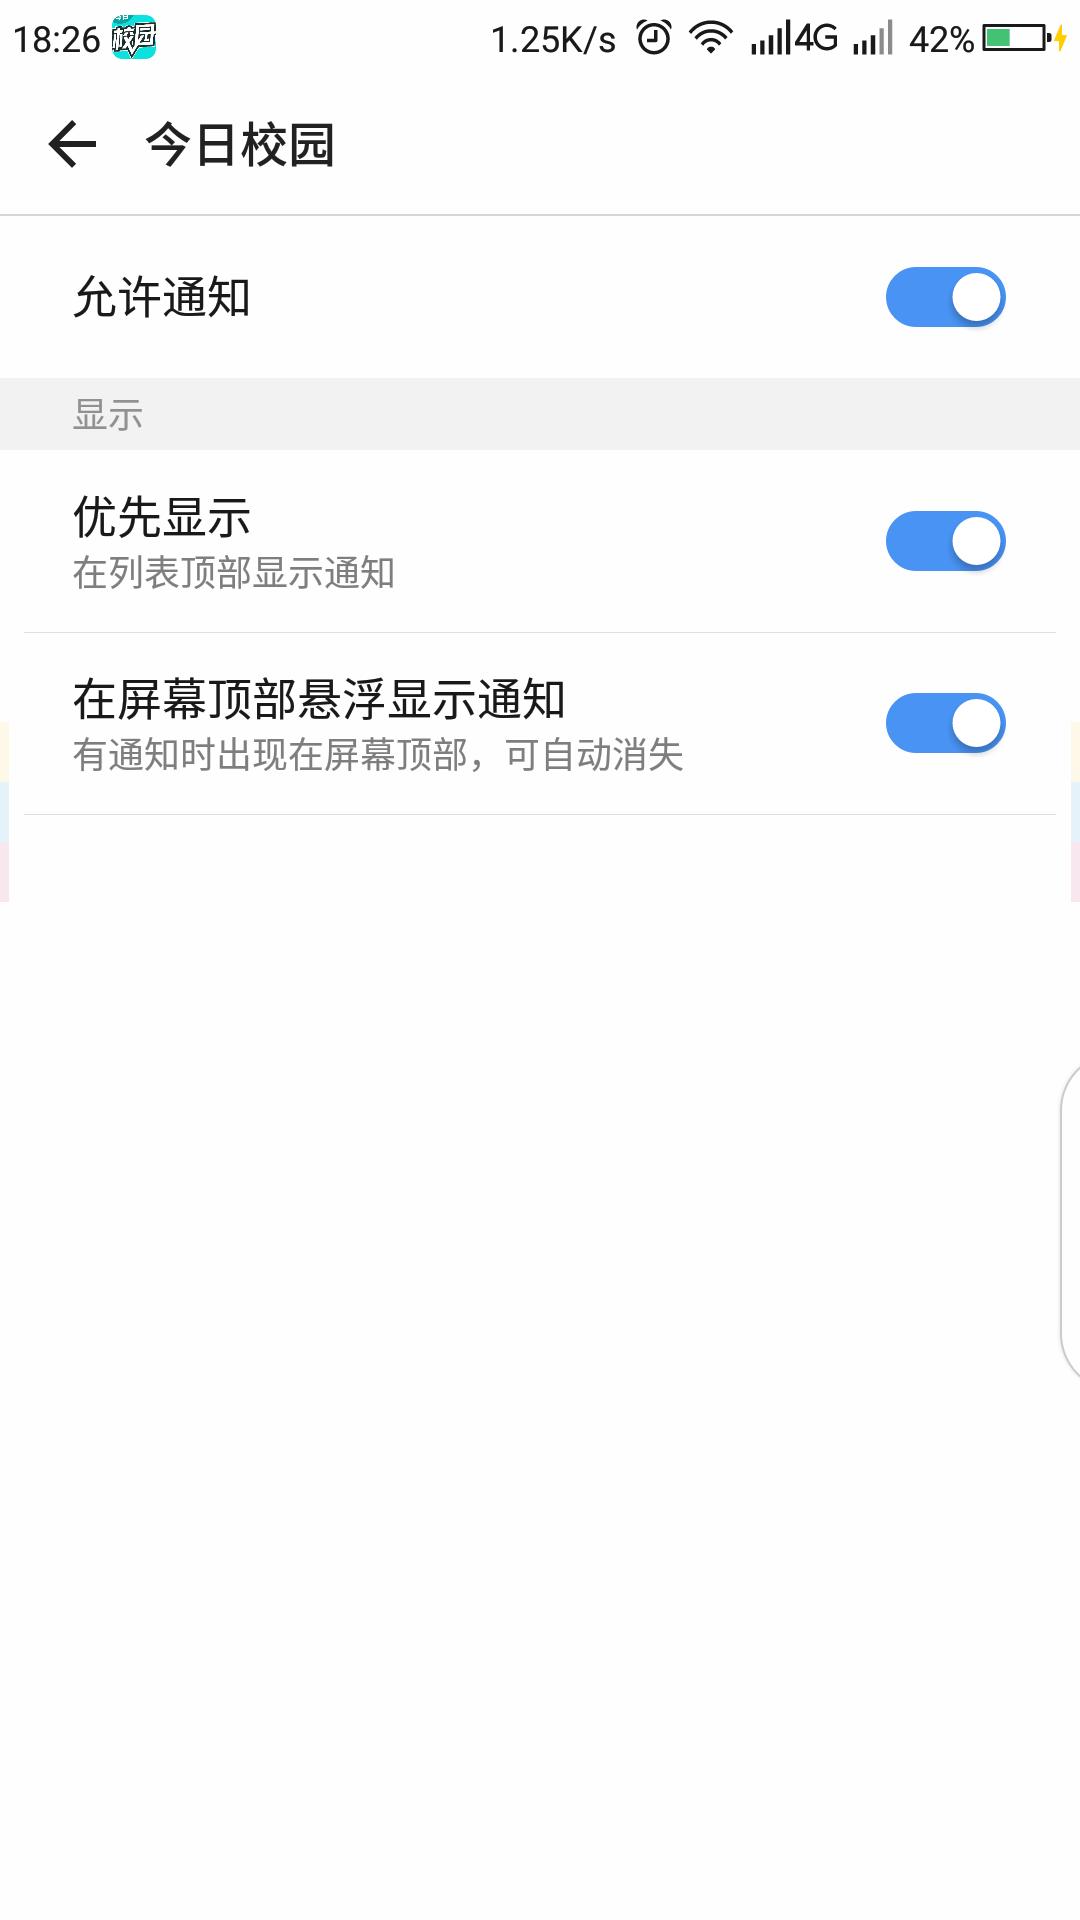 Screenshot_2018-06-14-18-26-40.png